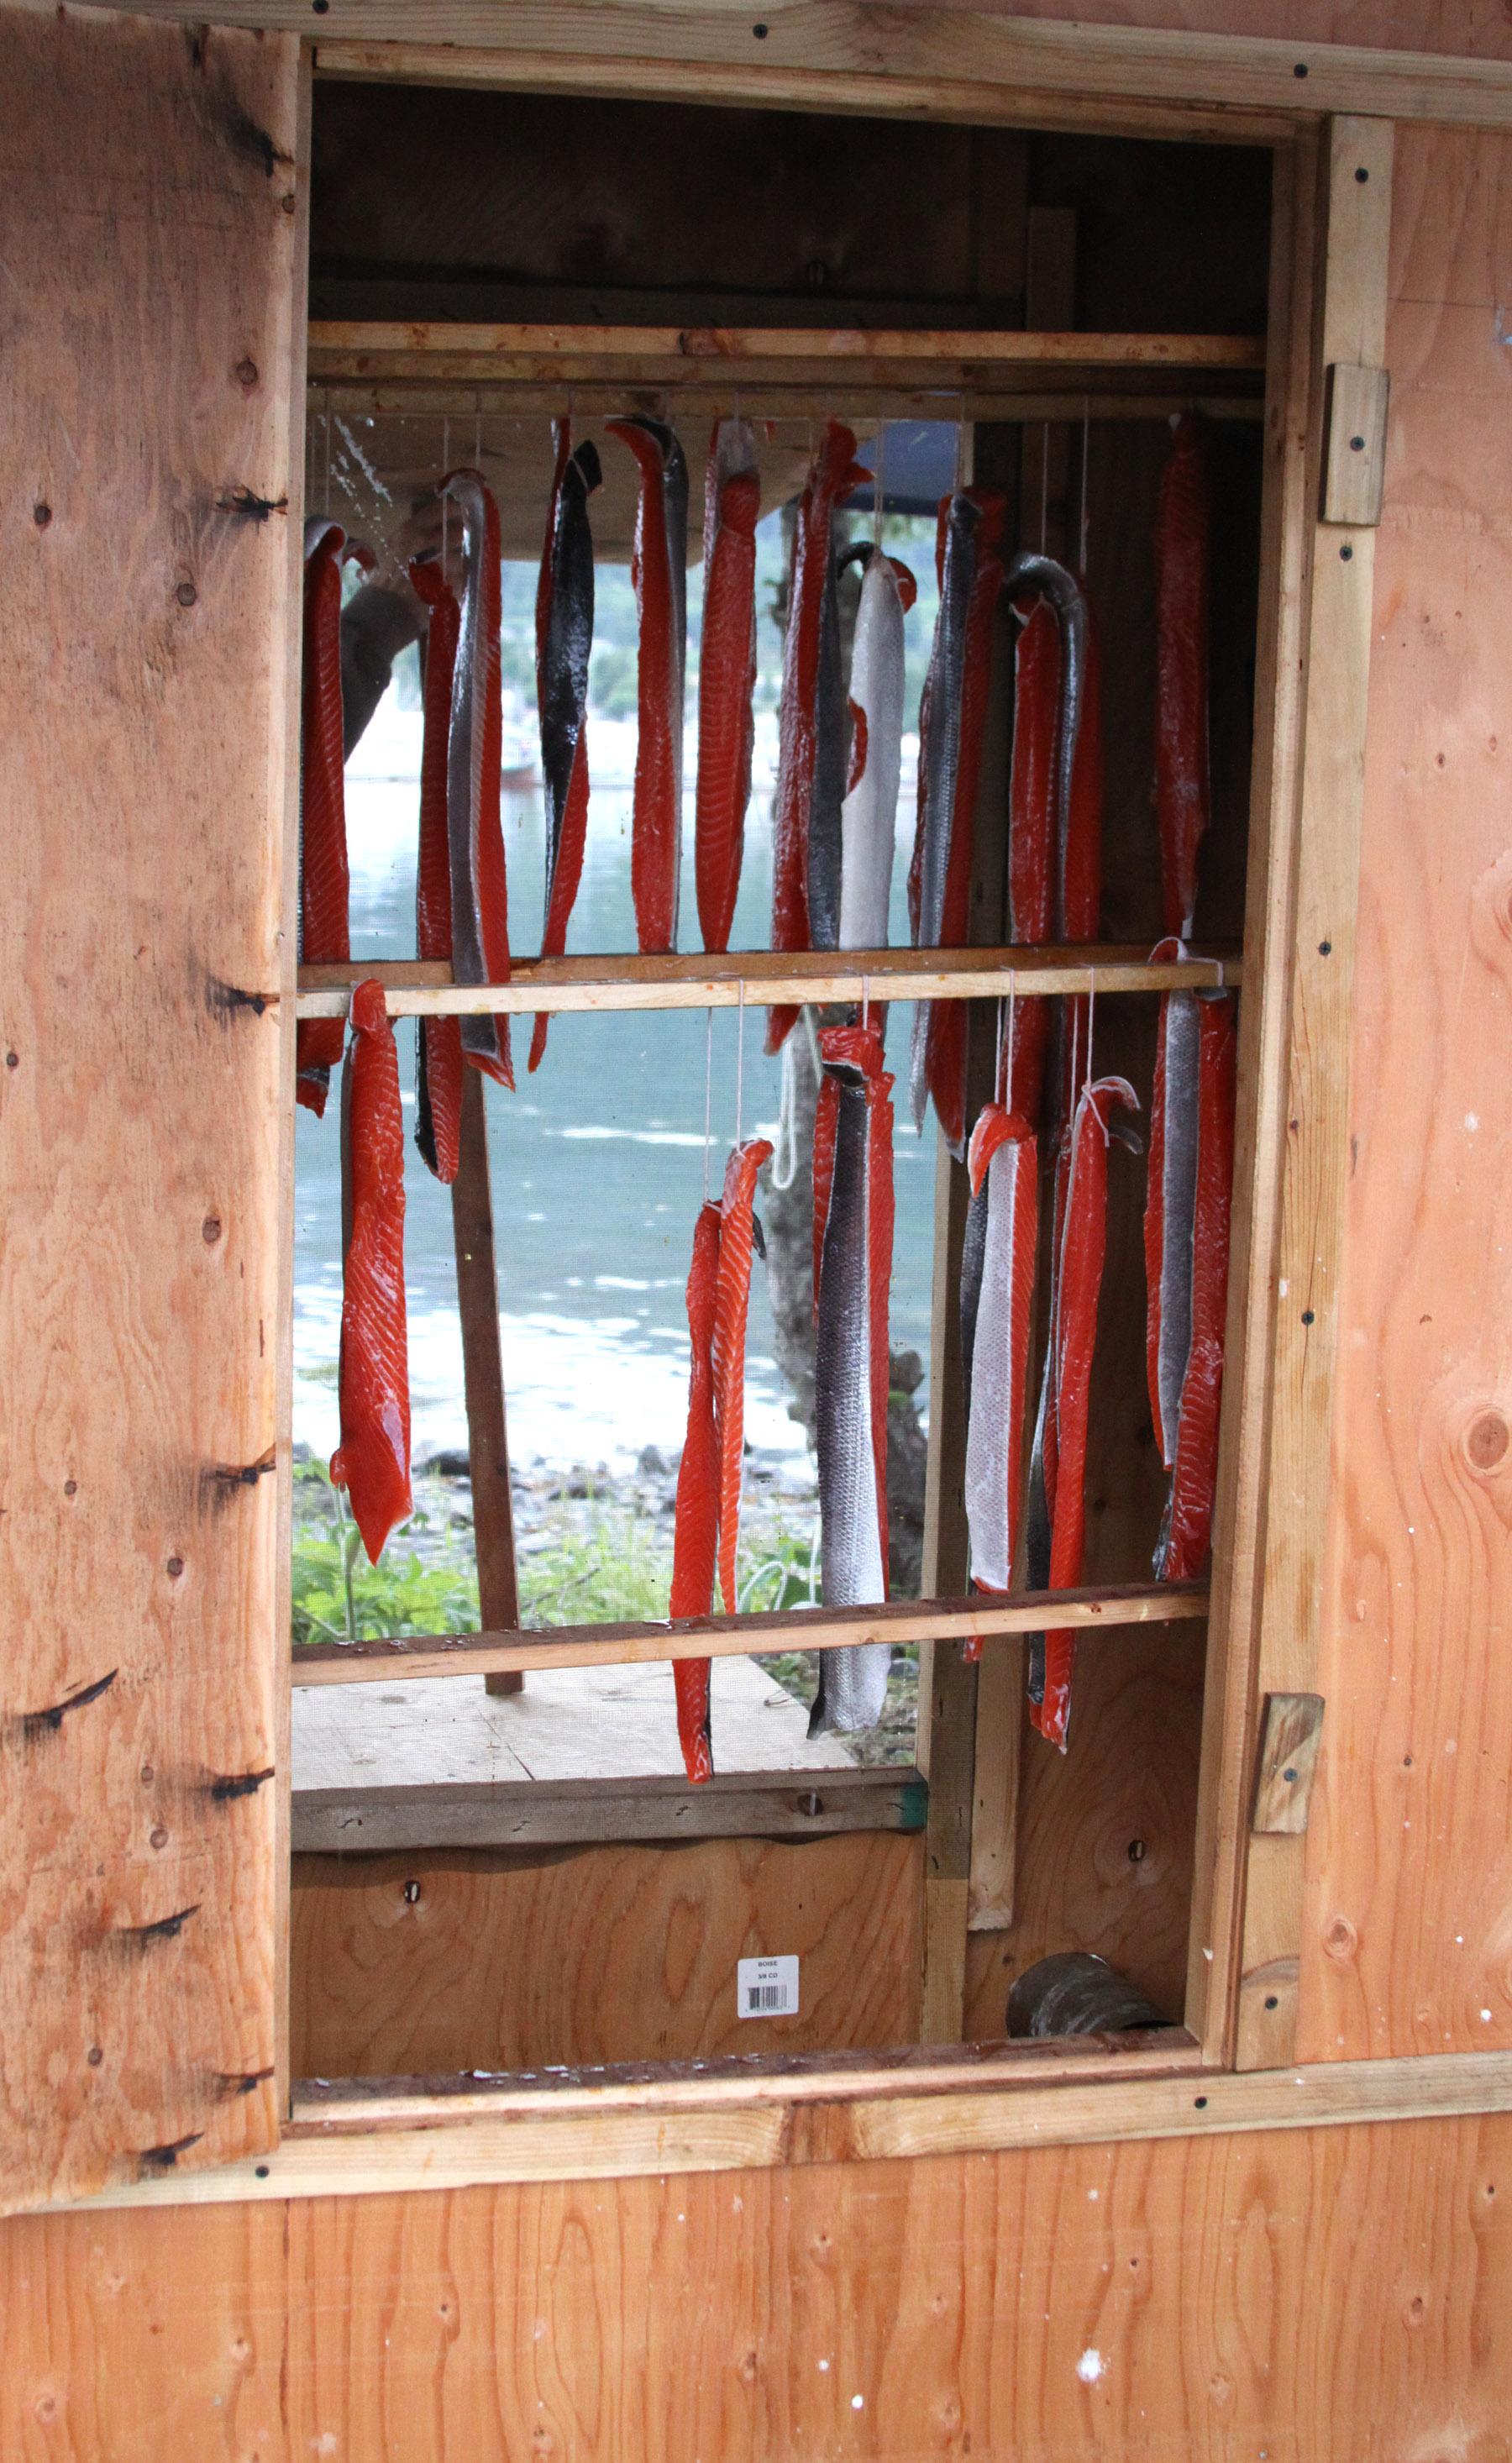 Sockeye salmon hangs from the racks in the smoker.